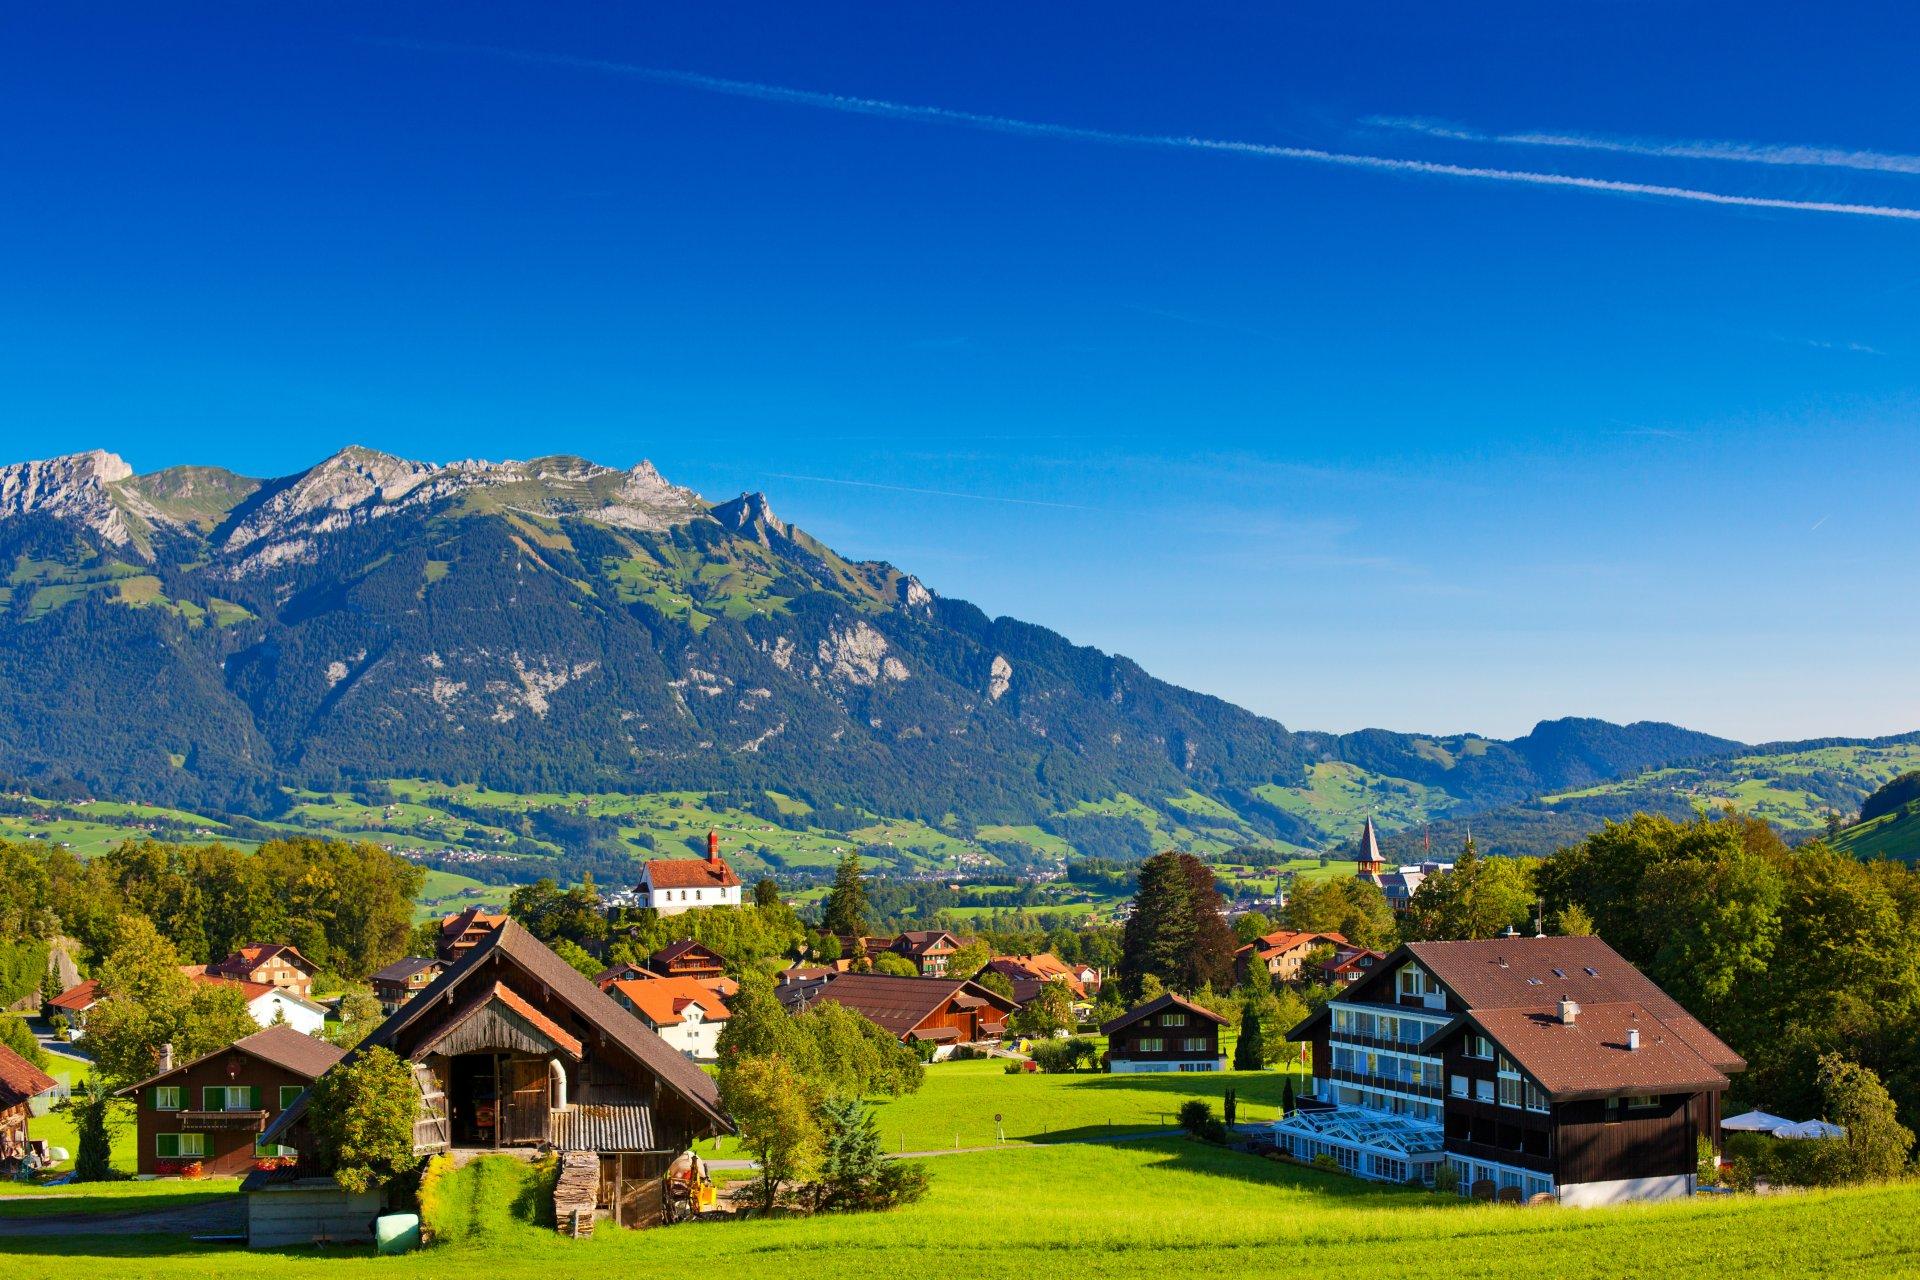 Обои дома, швейцария. Пейзажи foto 9